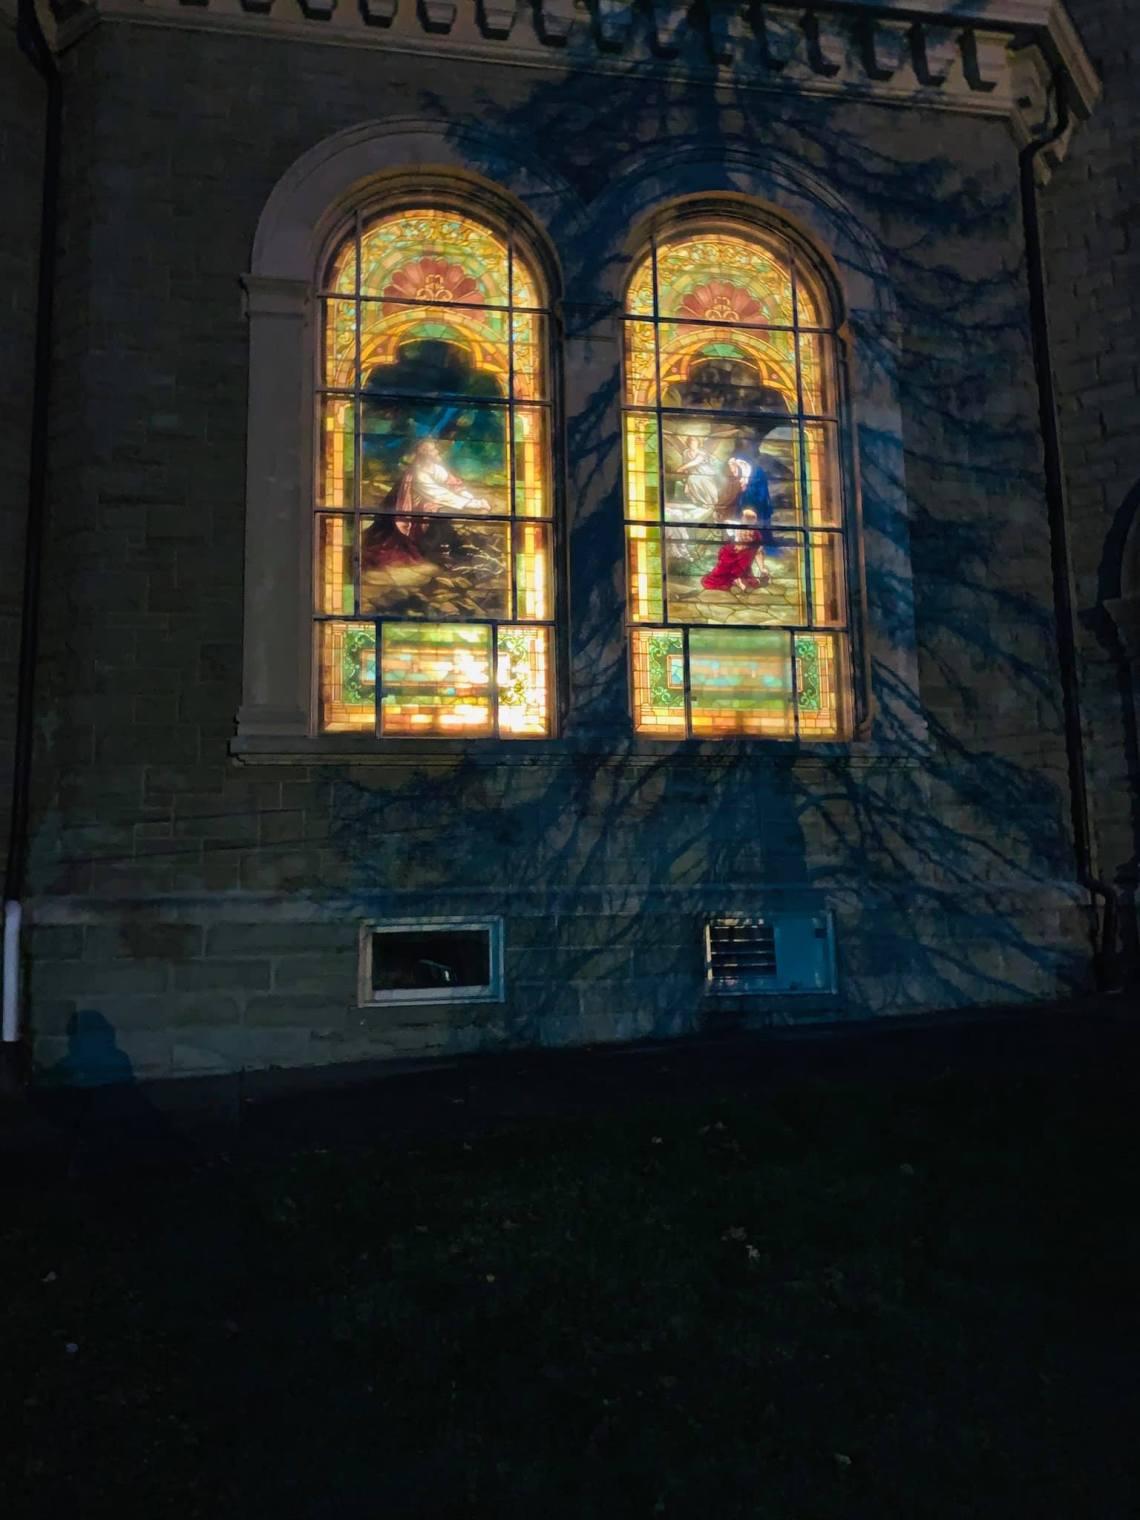 The windows light up at night, 2020!